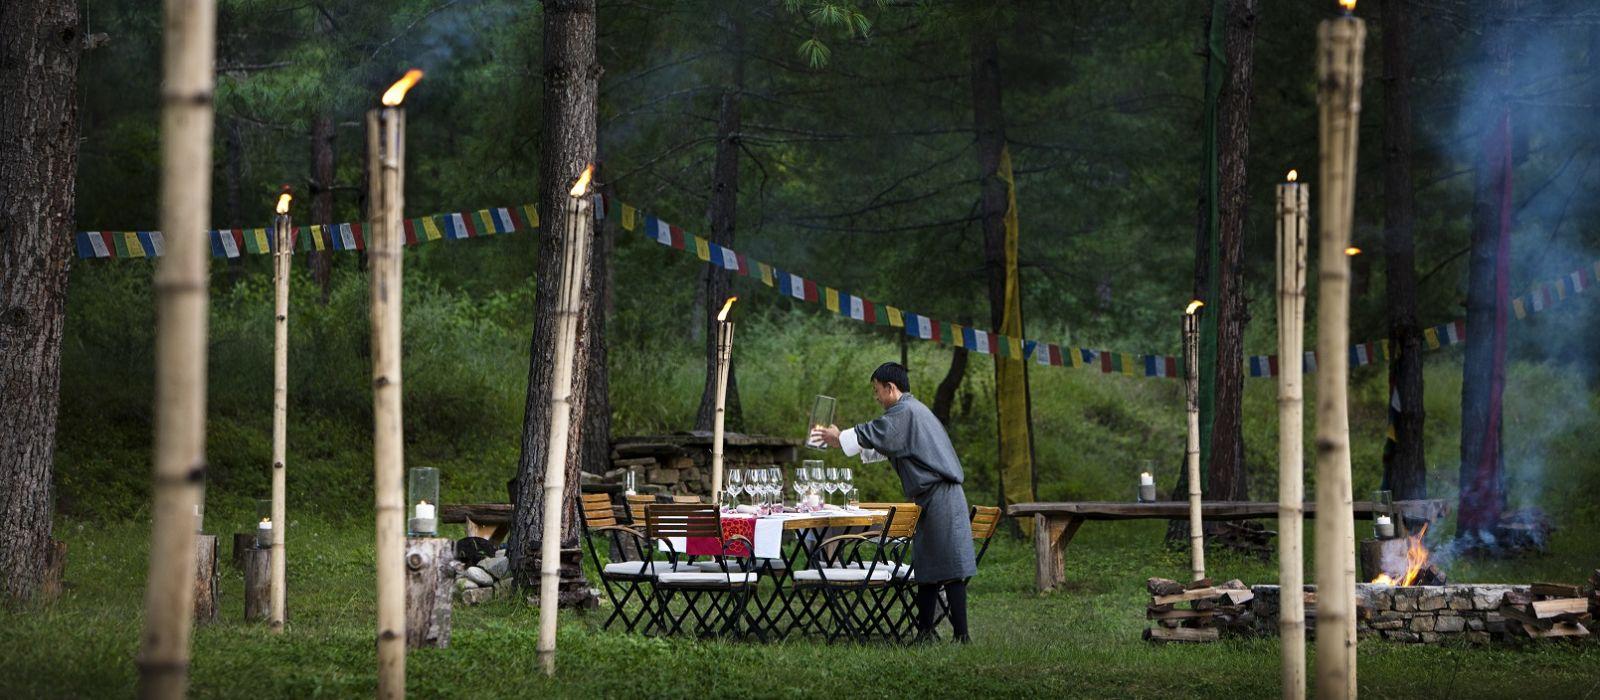 Exklusive Bhutan Luxusreise Urlaub 2